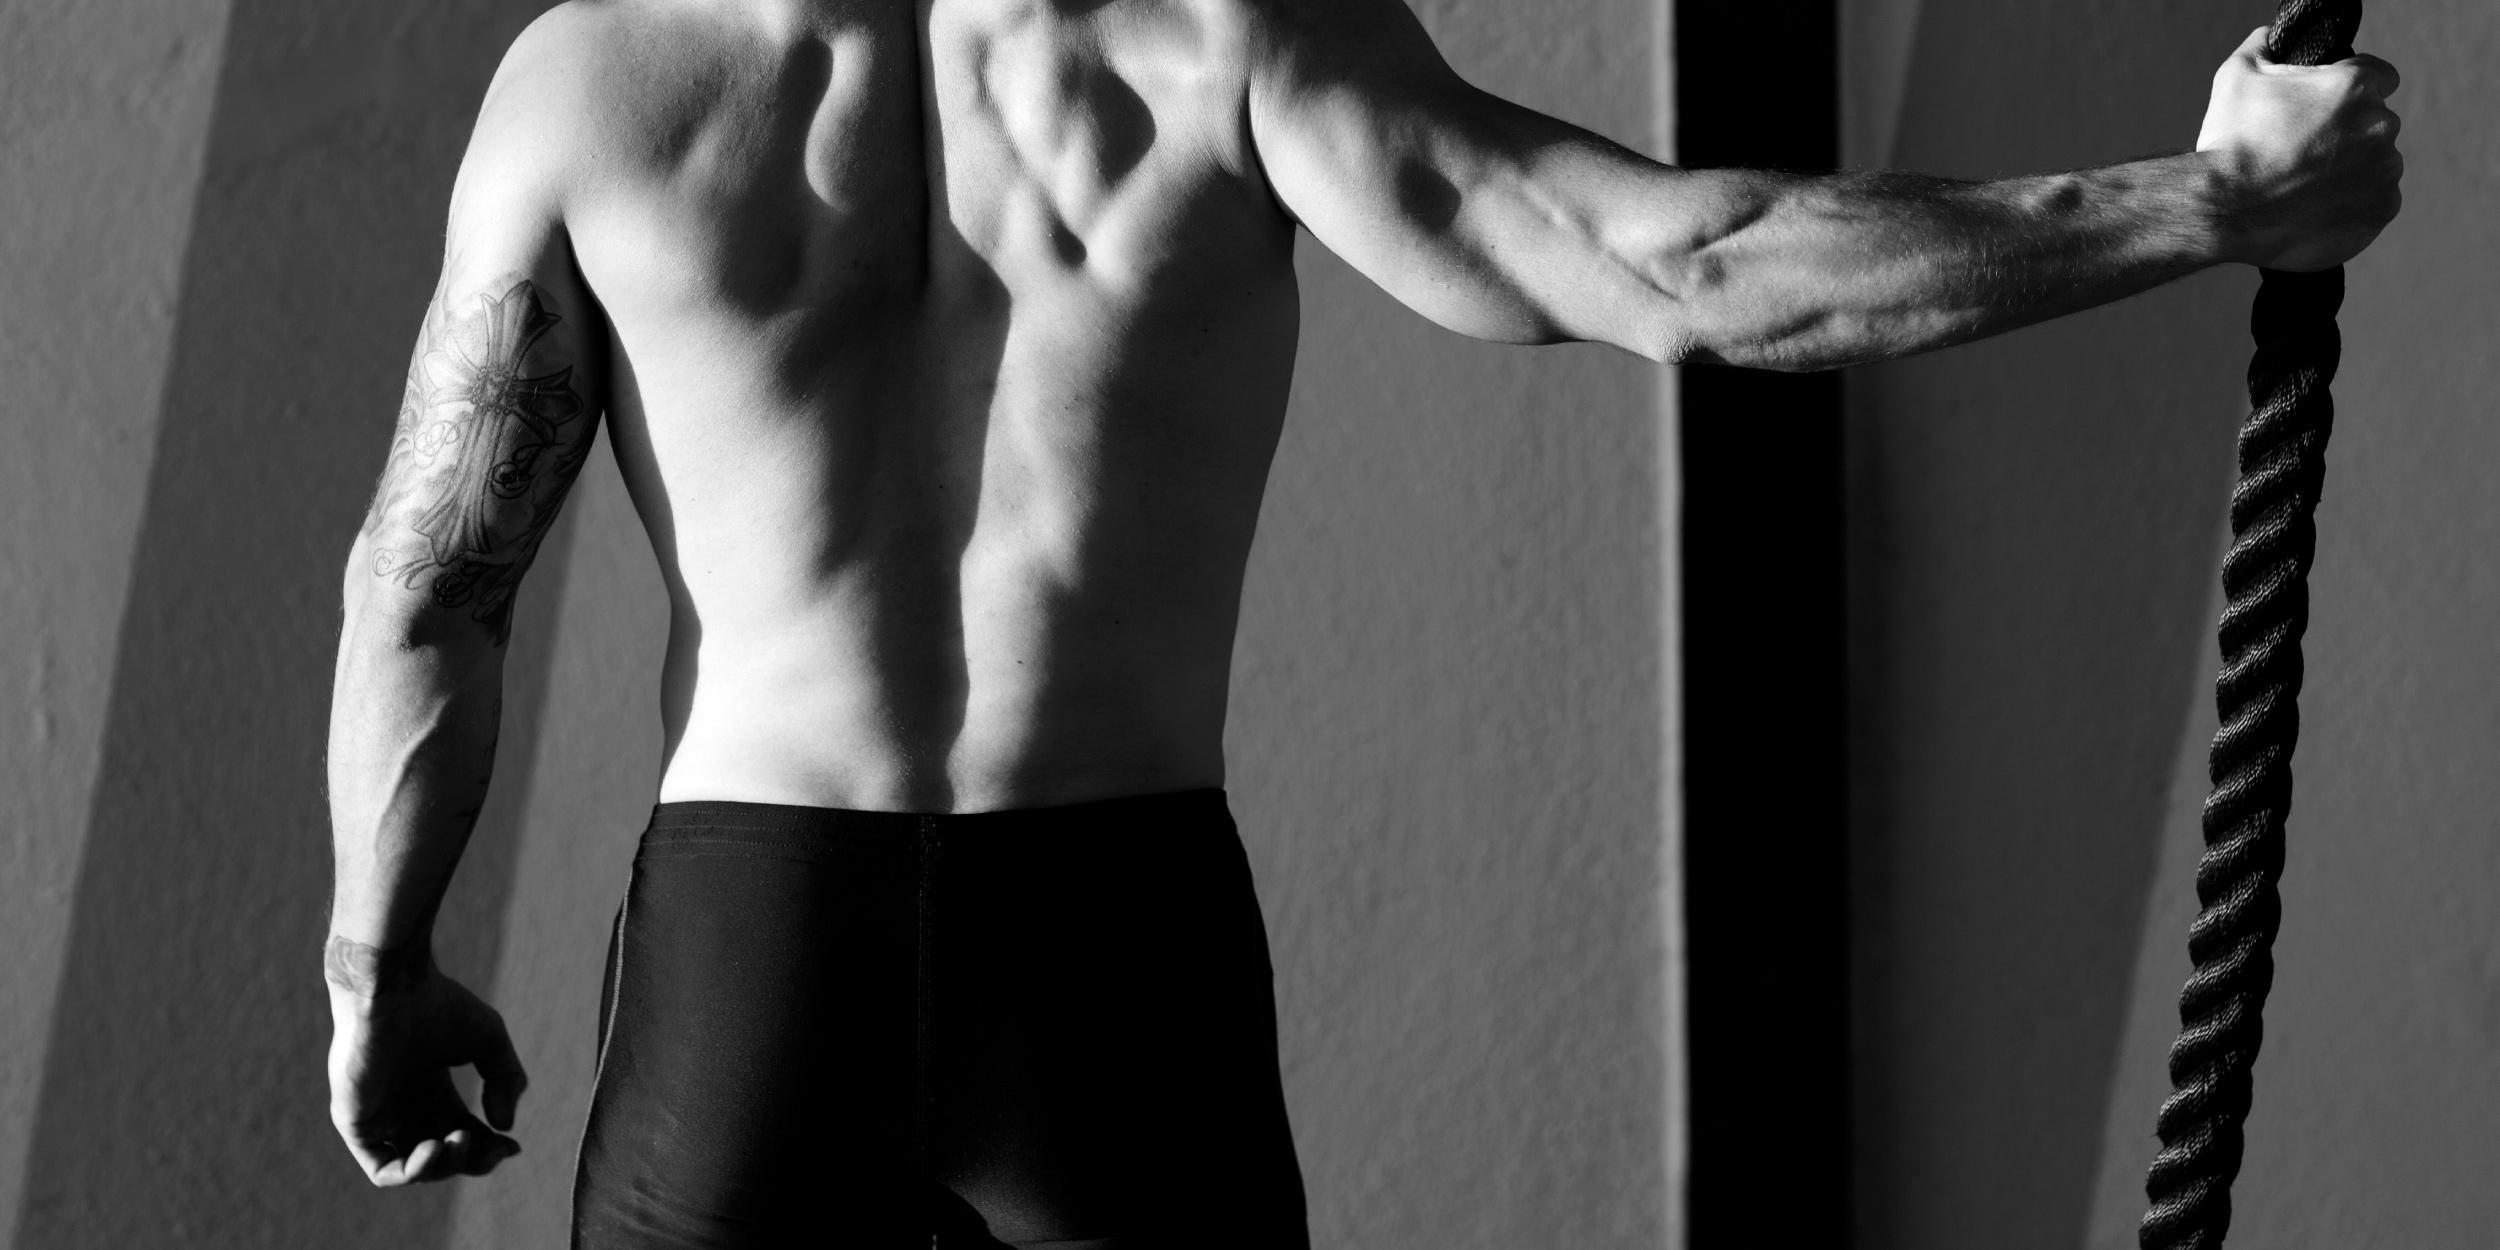 Какие мышця нужна для секса